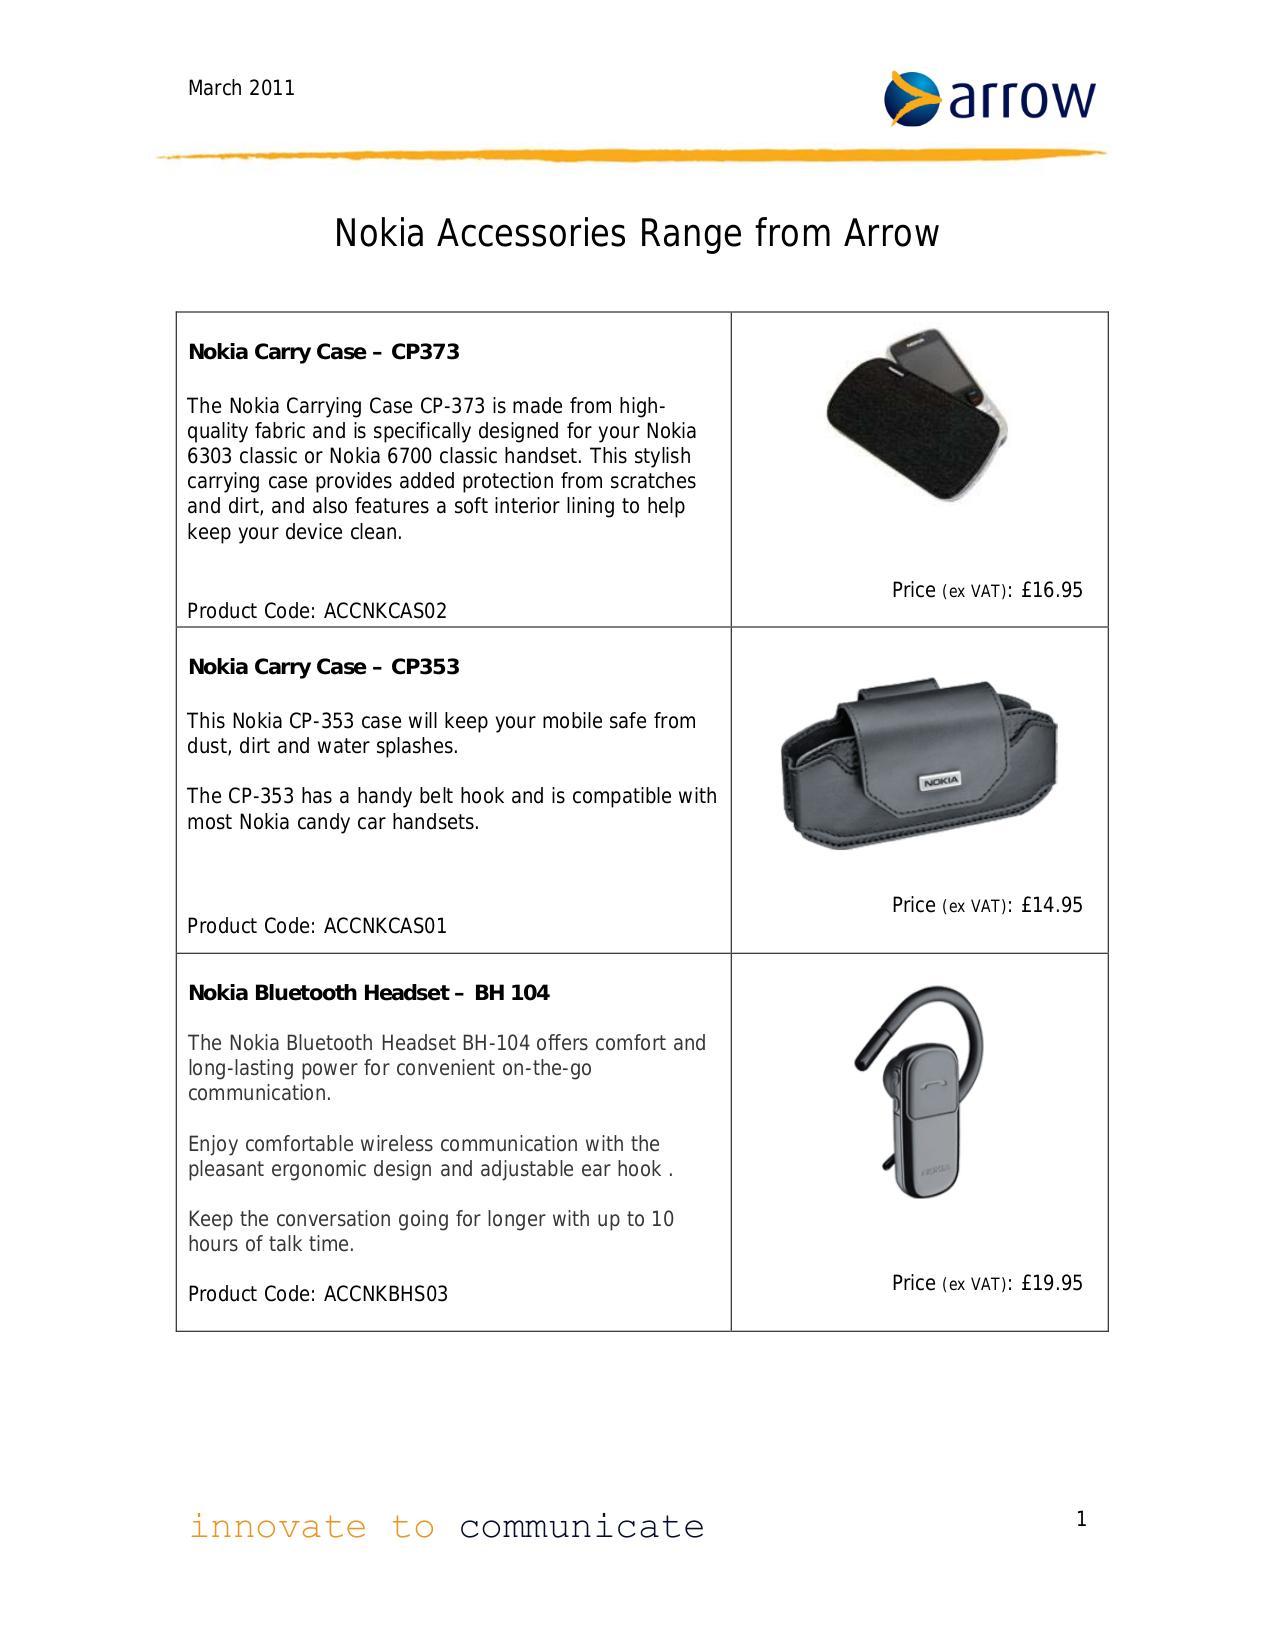 pdf for Nokia Headset BH-104 manual